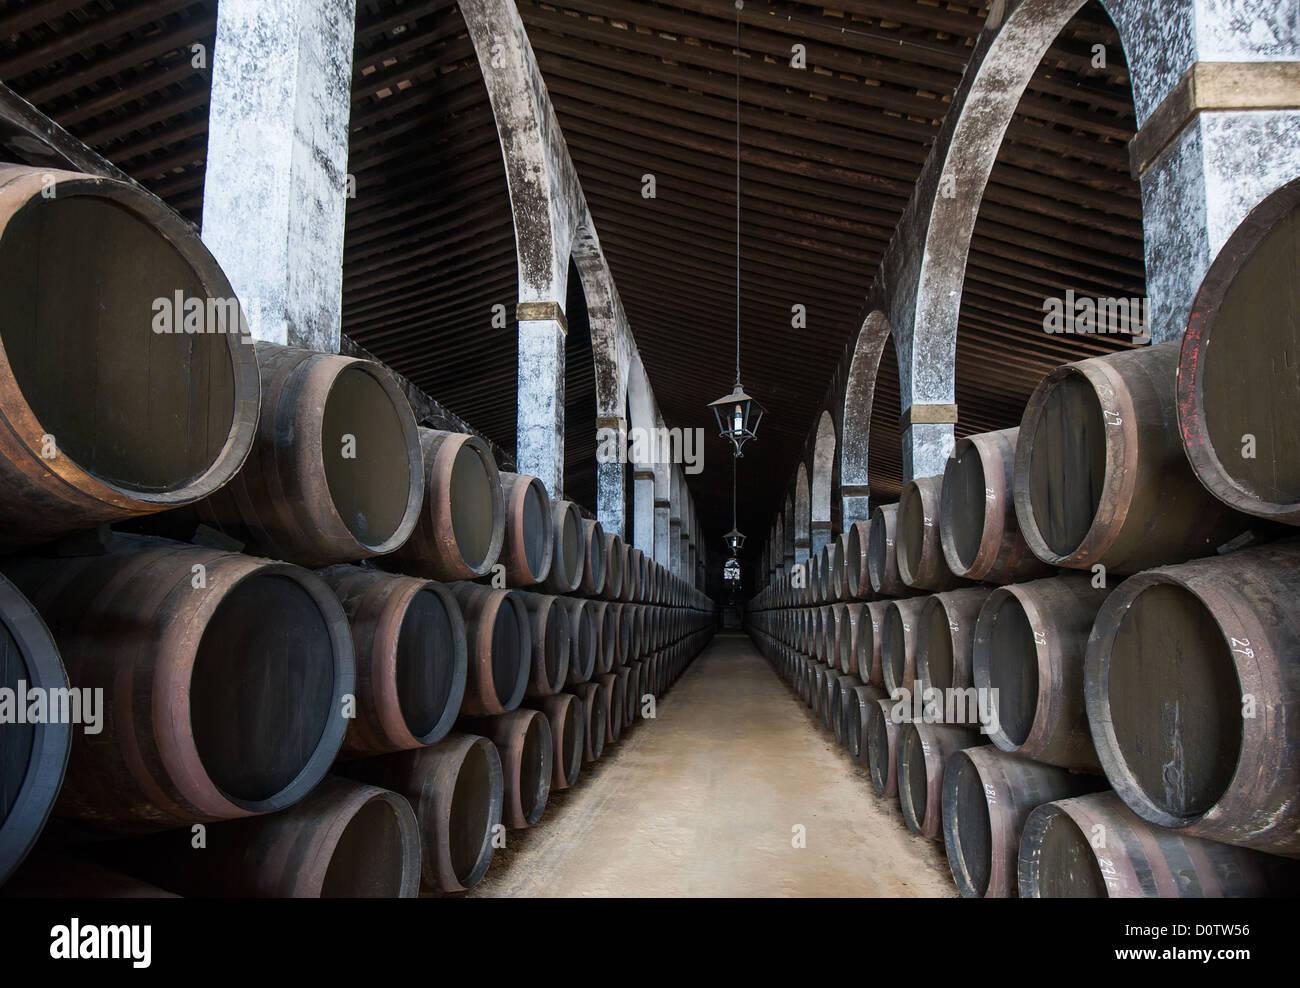 Sherry barili di Jerez bodega, Spagna Foto Stock